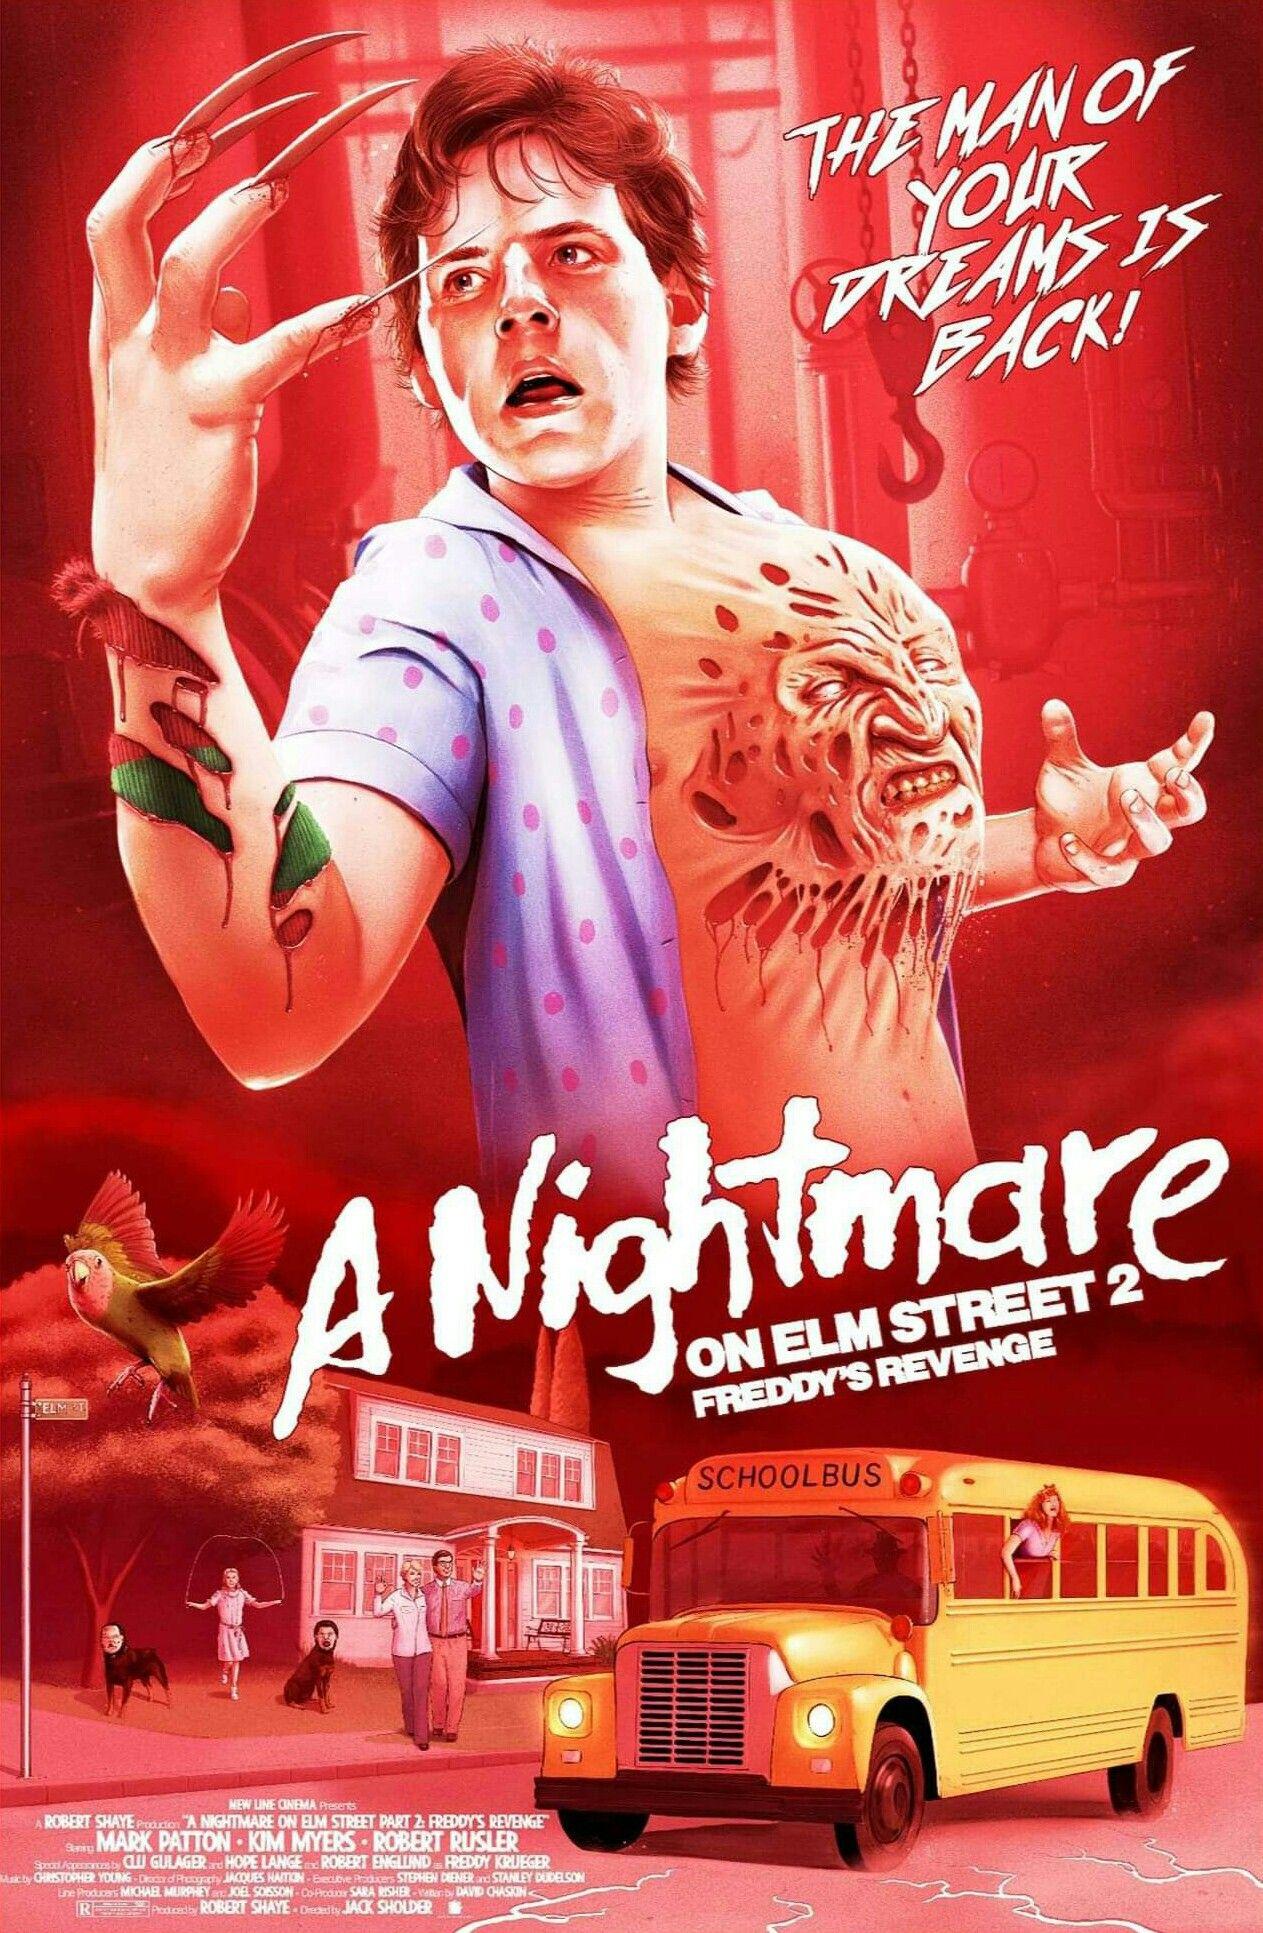 A Nightmare On Elm St 2 Freddy S Revenge In 2020 Horror Movie Icons Nightmare On Elm Street A Nightmare On Elm Street